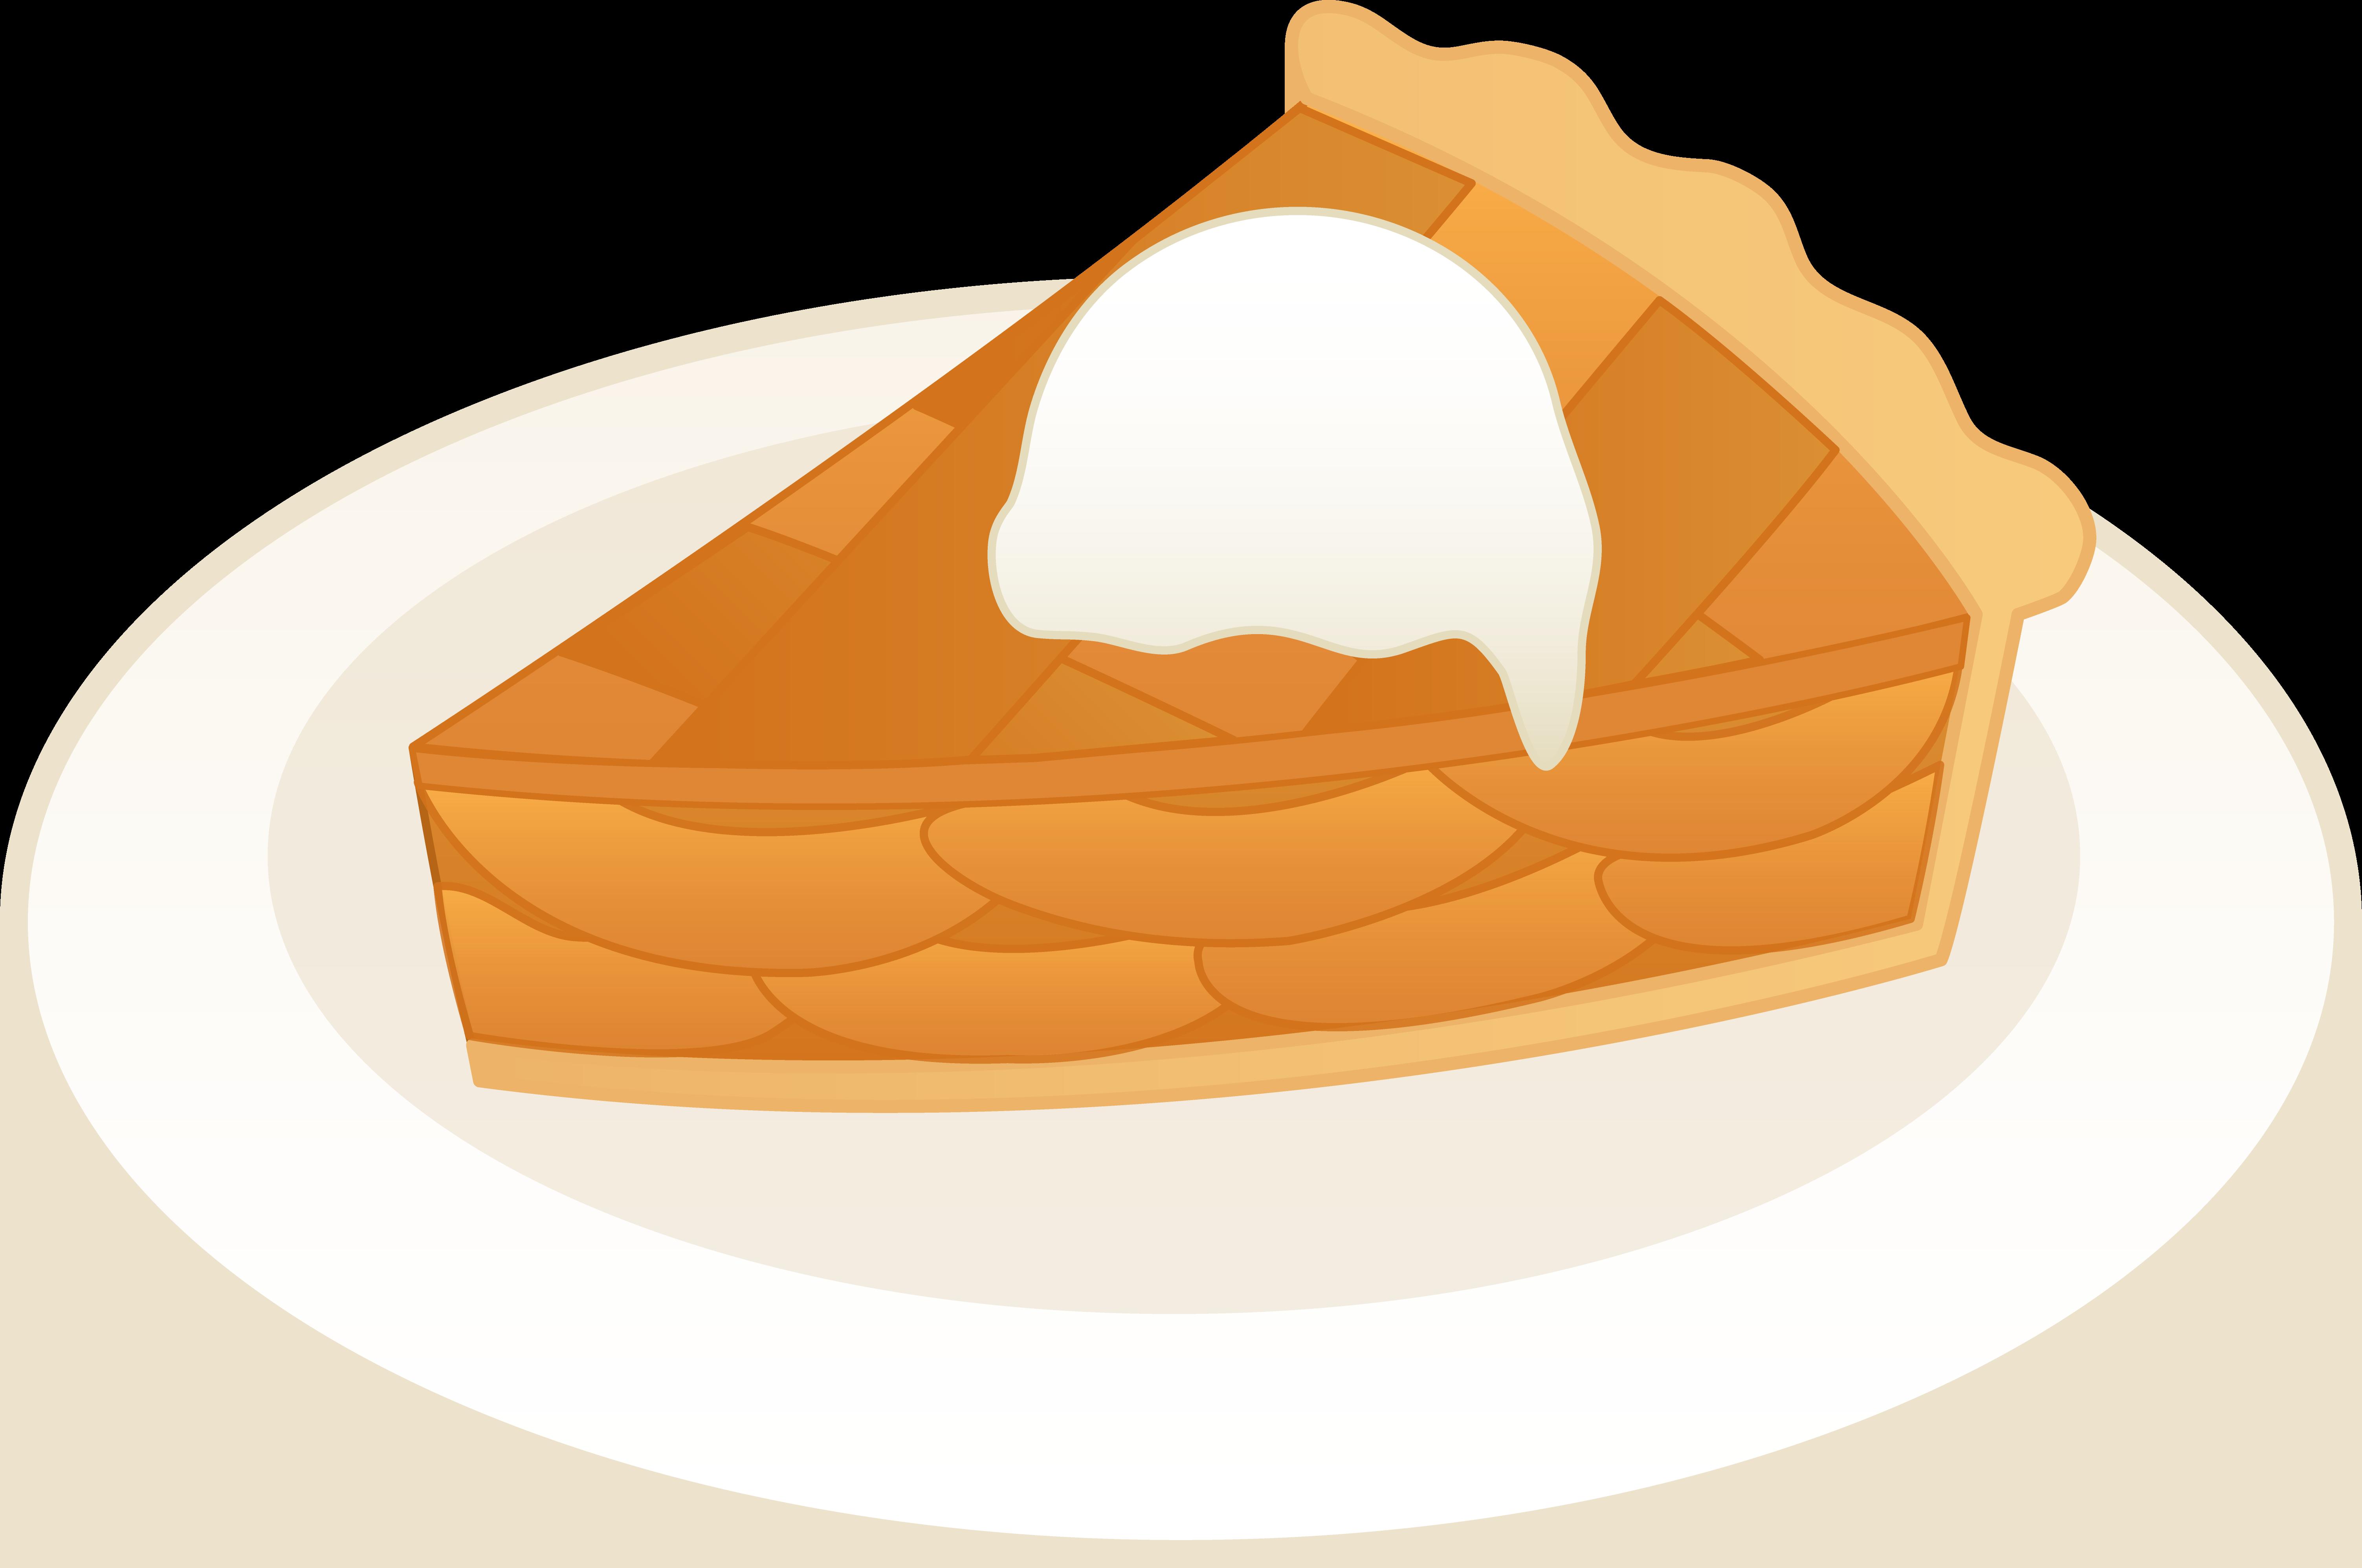 ... apple-pie-with-ice-cream-clip-art-apple-pie-a-la-mode---free-clip-art